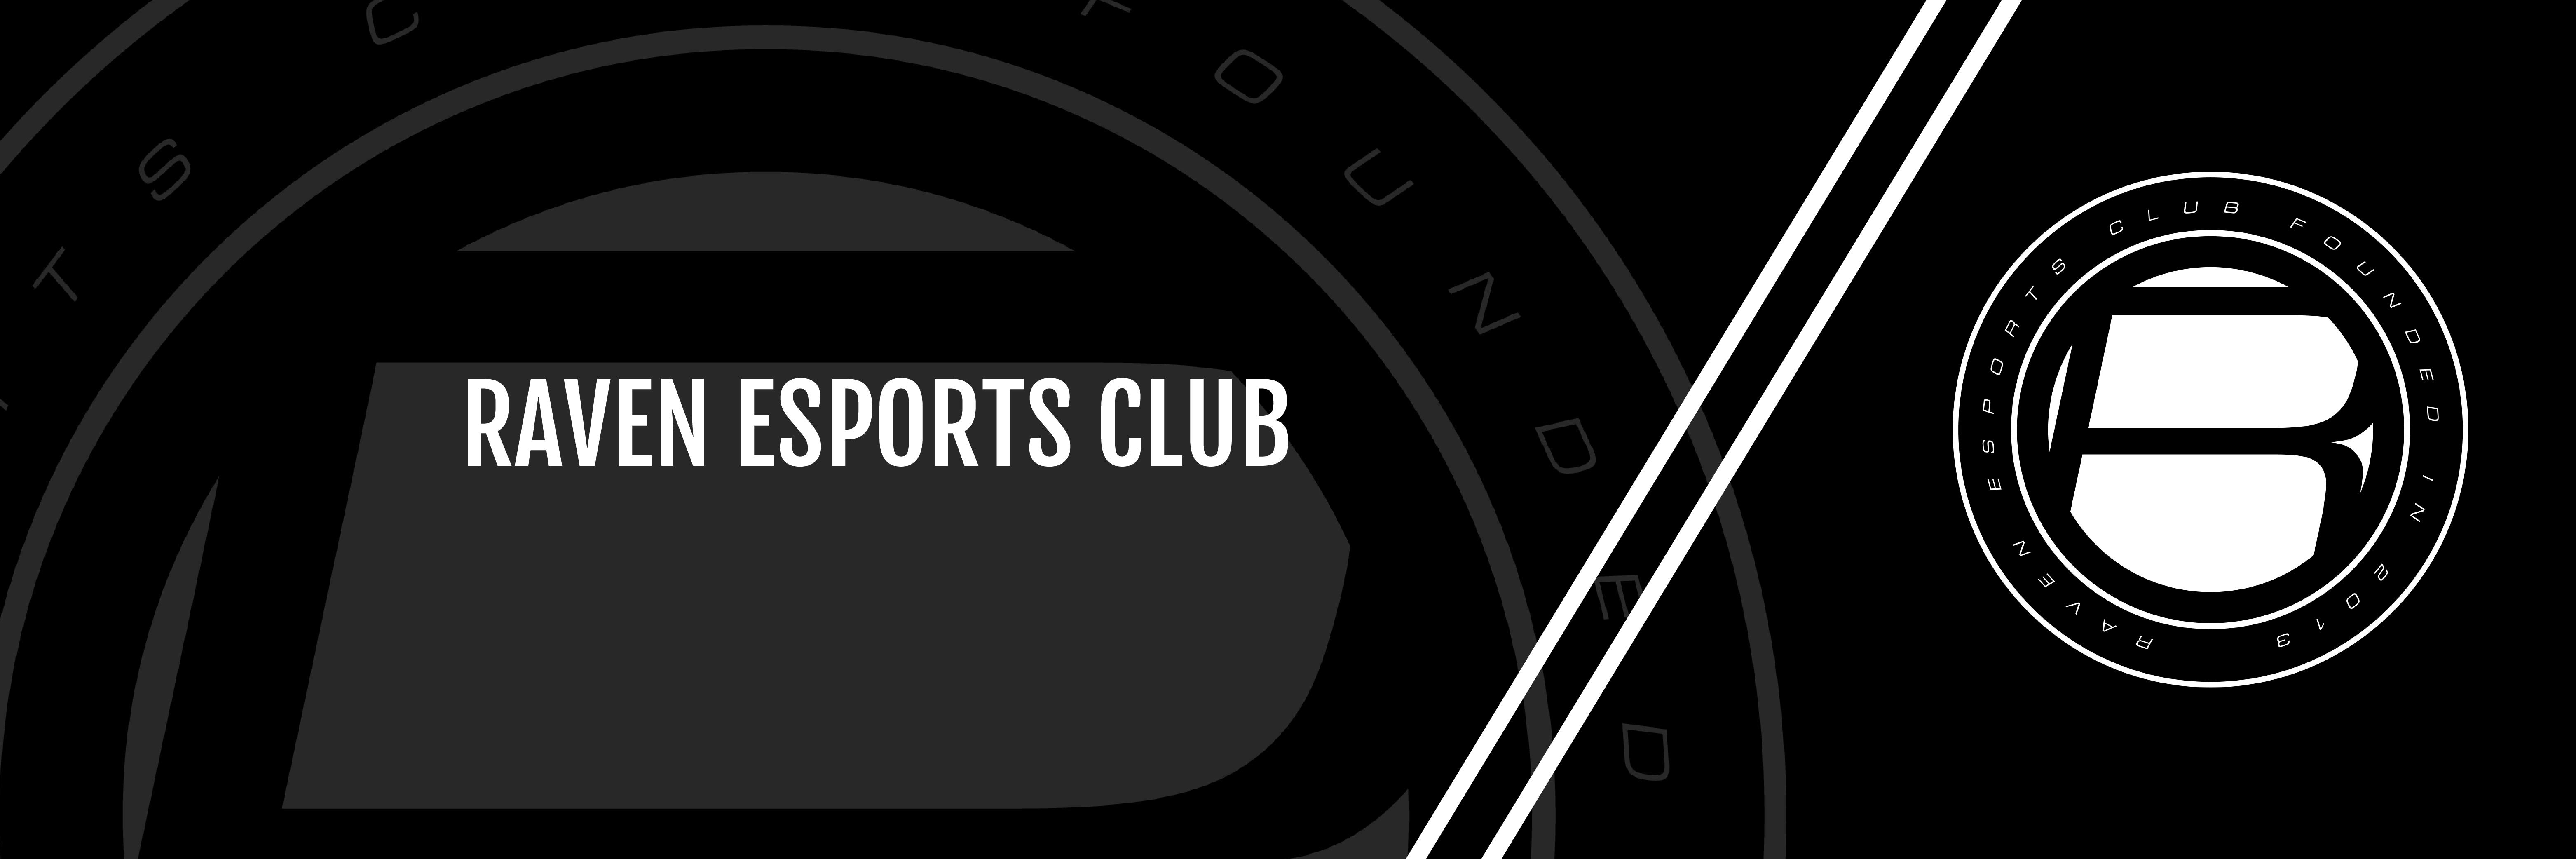 Background Raven Esports Club